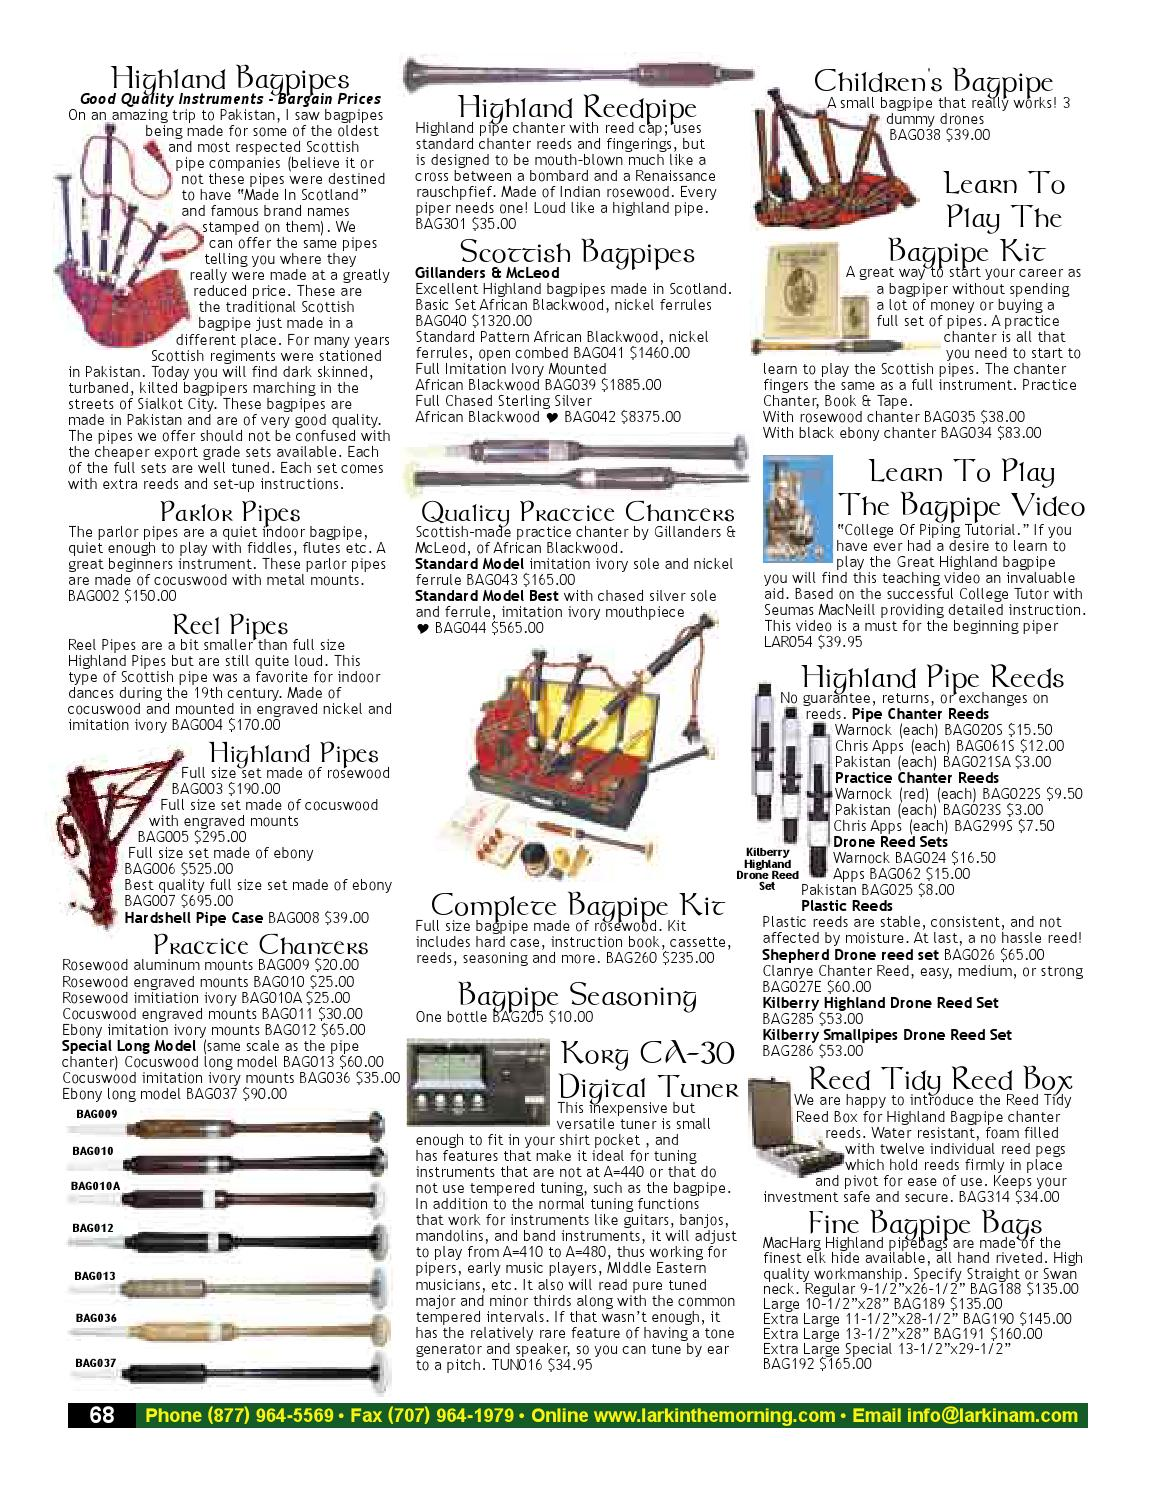 Scottish Bagpipe Rosewood Imattion Ivory Mounts with Hard Case//Practice Chanter